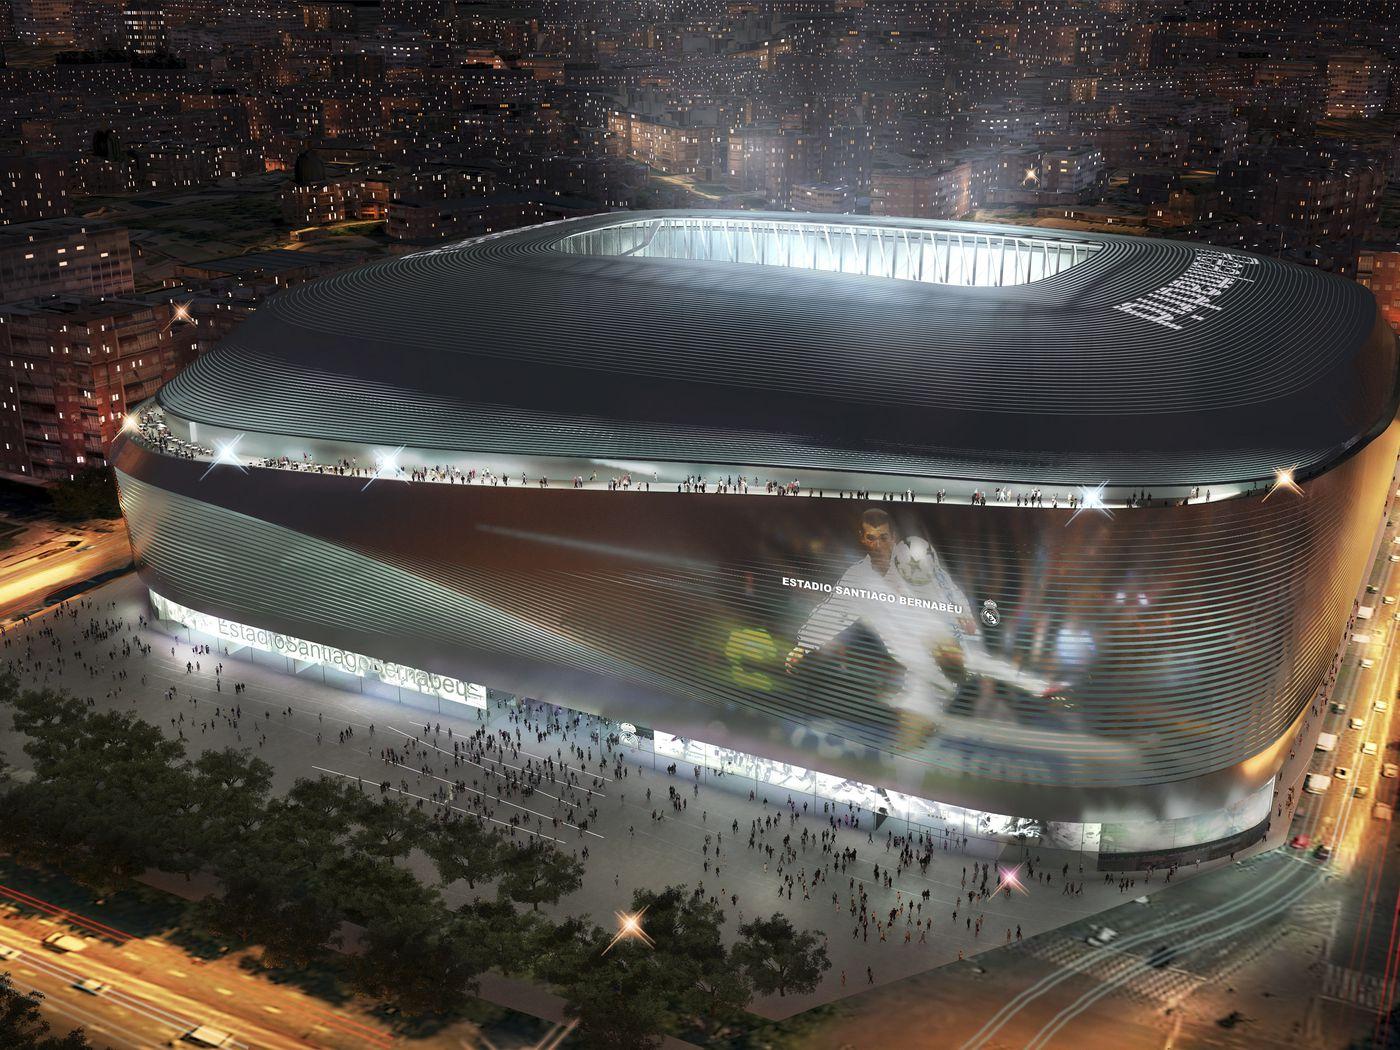 Real Madrid Release Video Of Santiago Bernabeu Stadium Renovations -  Managing Madrid